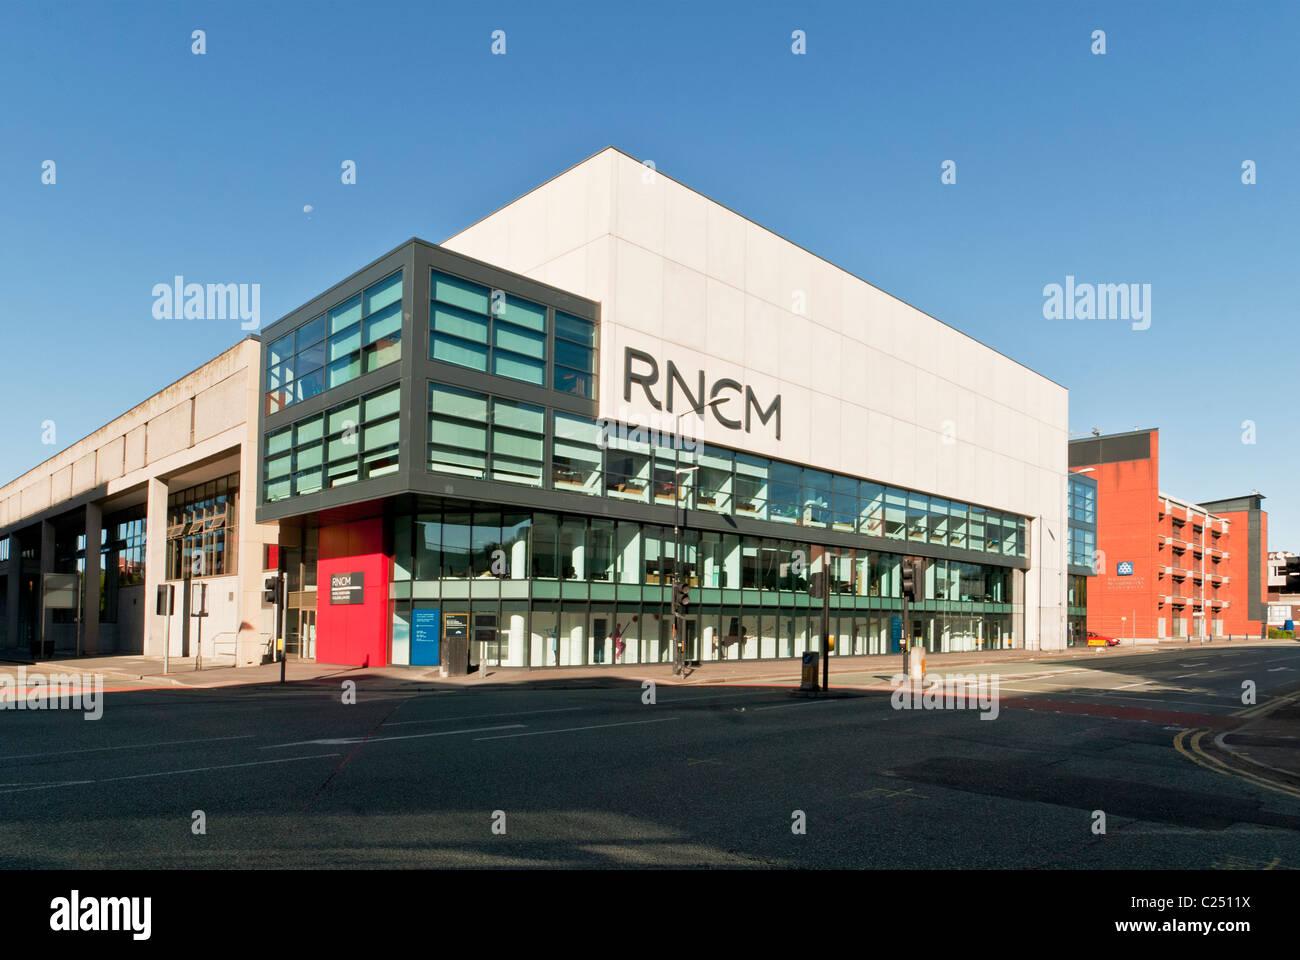 El Royal Northern College of Music (RNCM), Manchester, Inglaterra, Reino Unido. Foto de stock